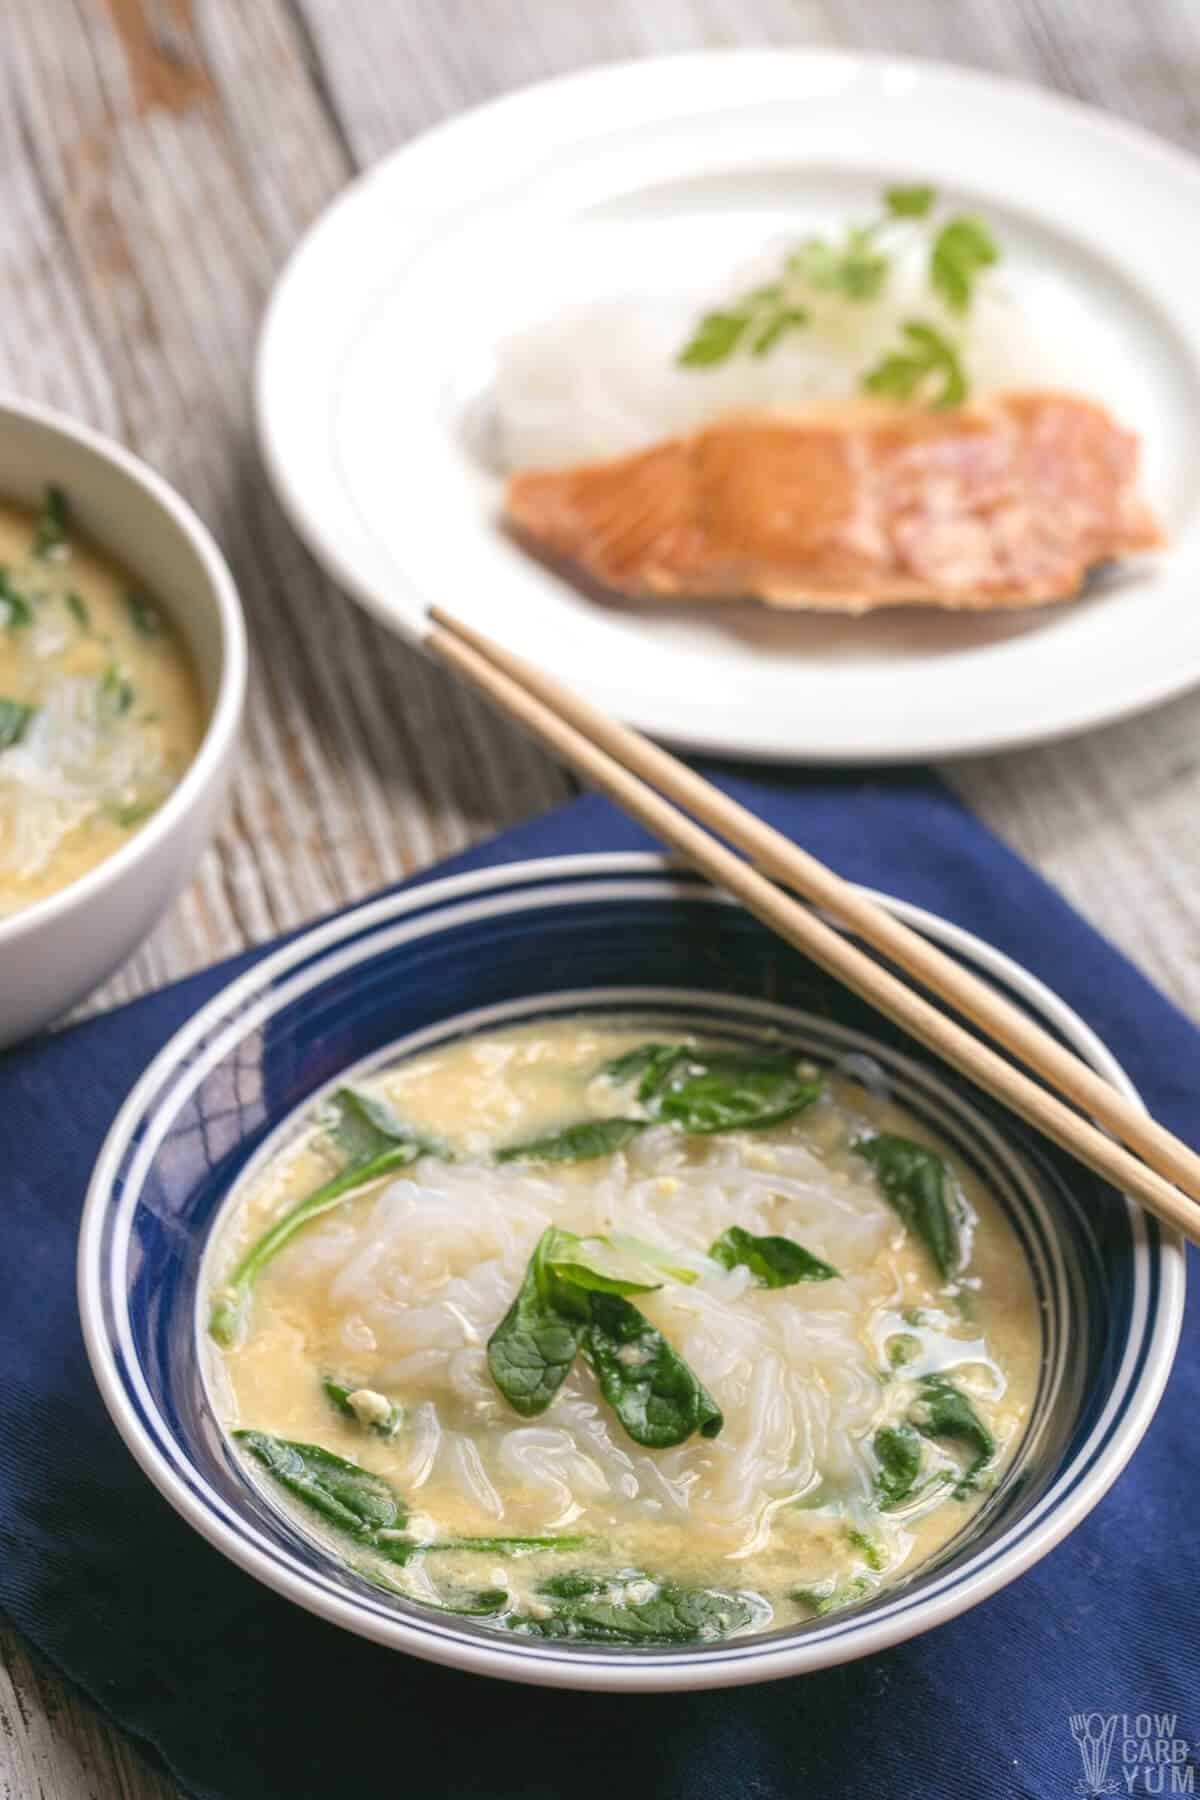 keto ramen noodle soup in bowl with chopsticks